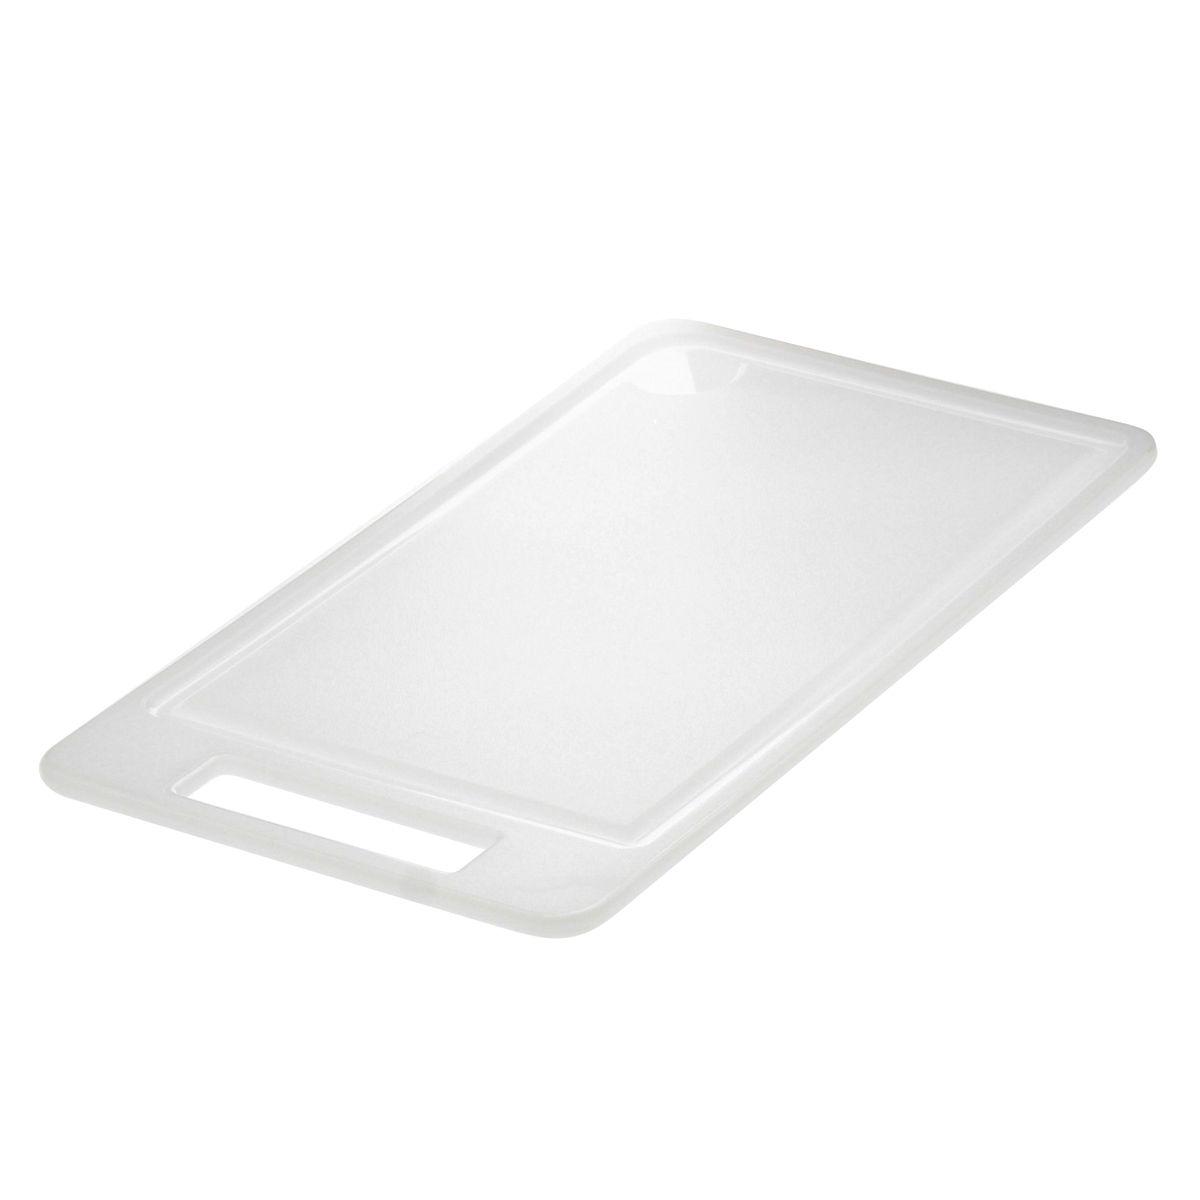 Planche blanche antibacterienne en polyéthylène 18x31 cm - Demolli